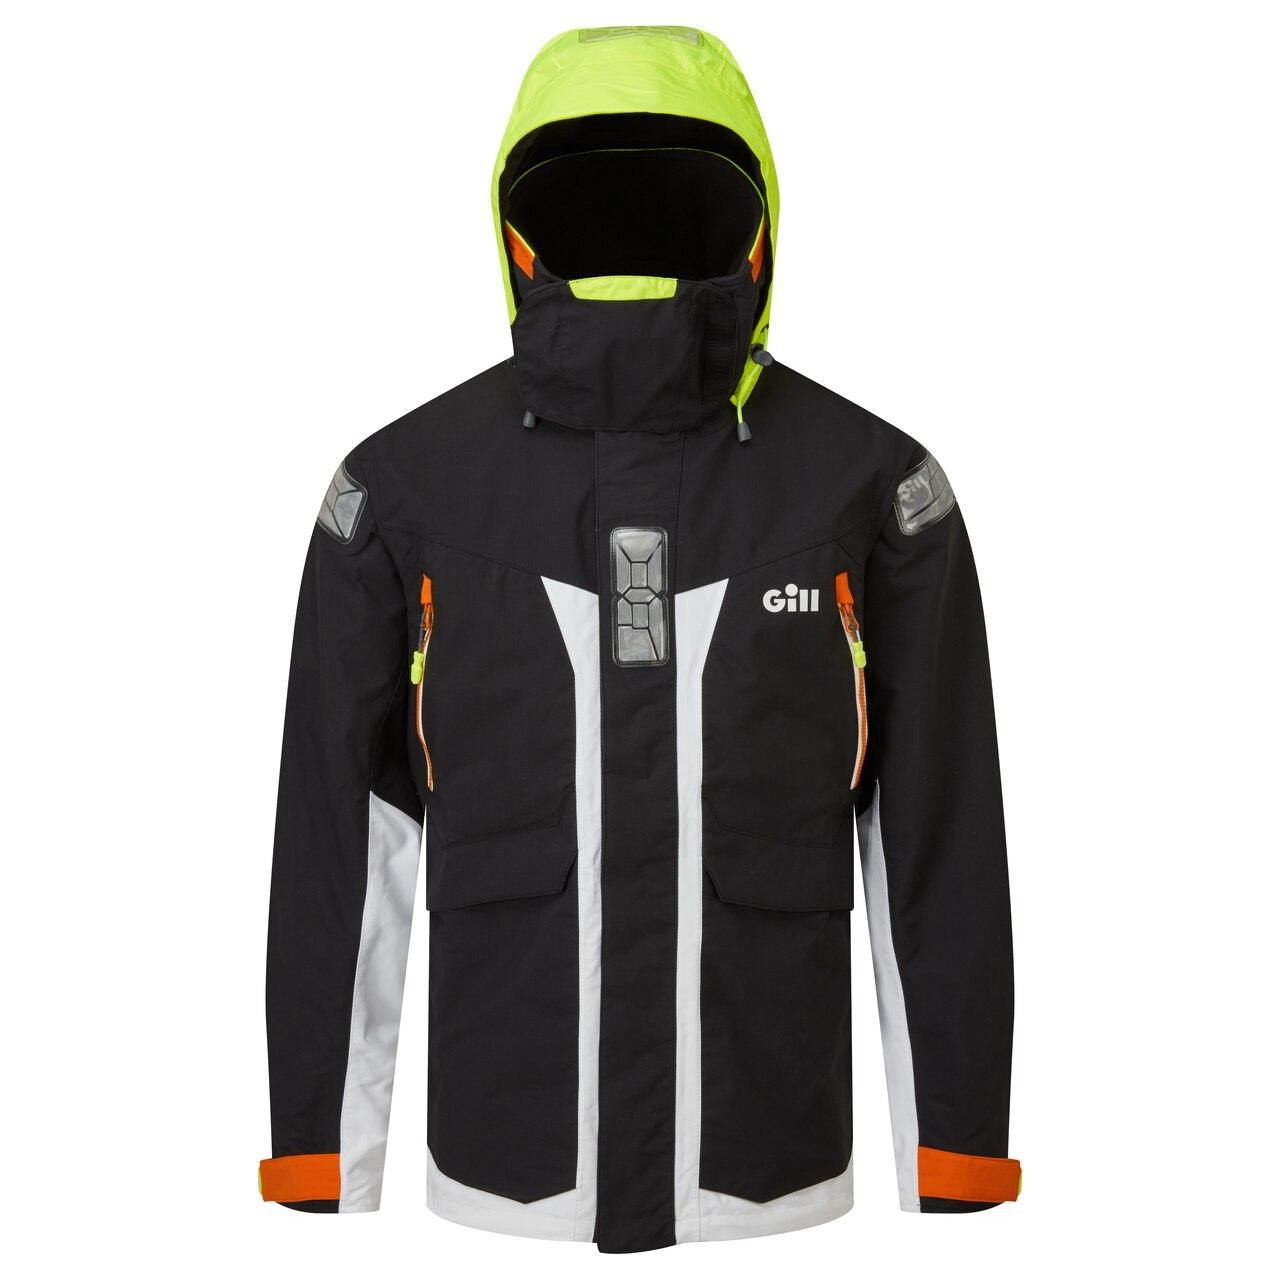 OS2 Offshore Men's Jacket - OS24J-BLKLTD_2.jpg